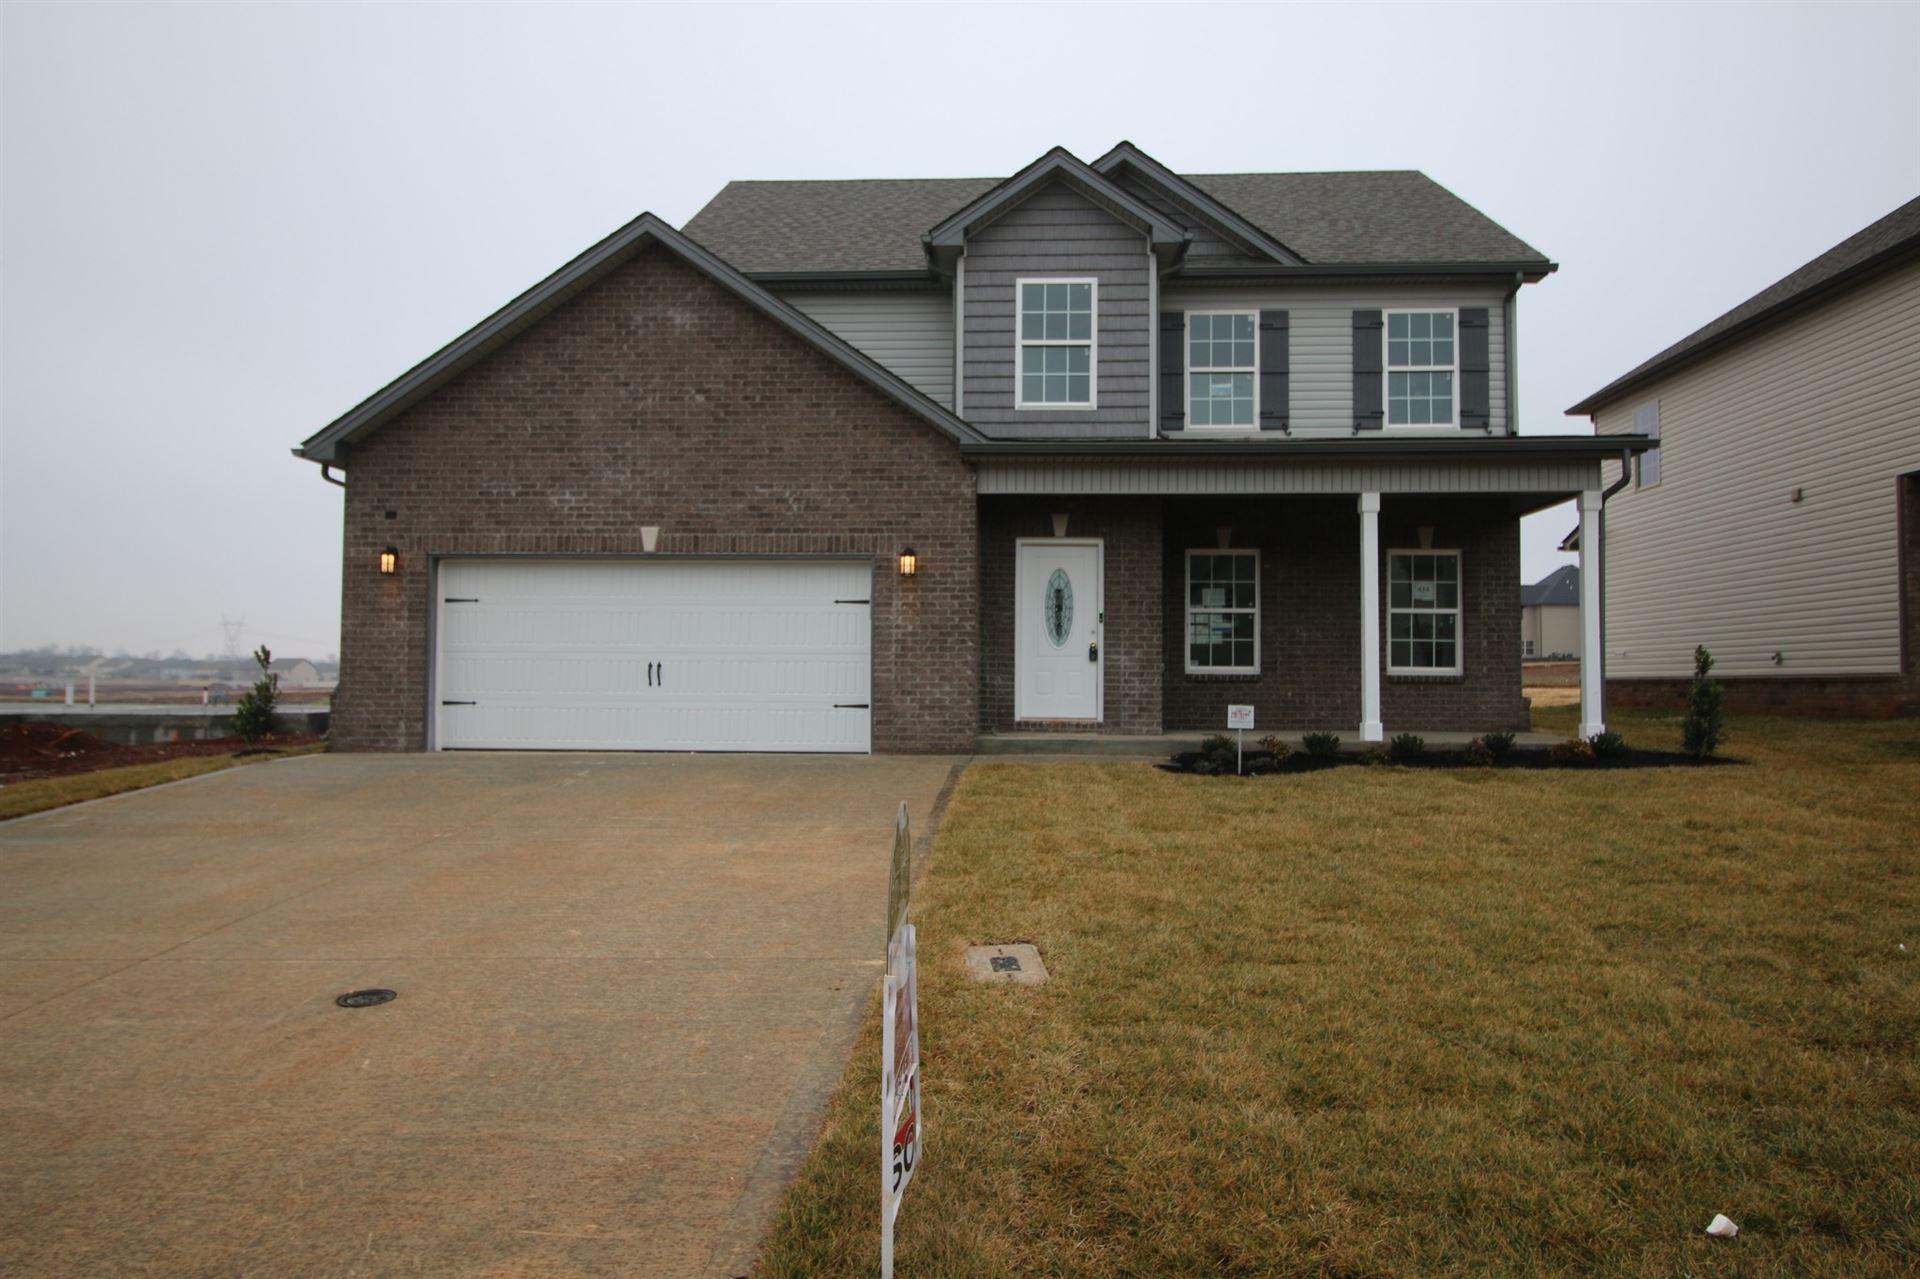 414 Summerfield, Clarksville, TN 37040 - MLS#: 2200468